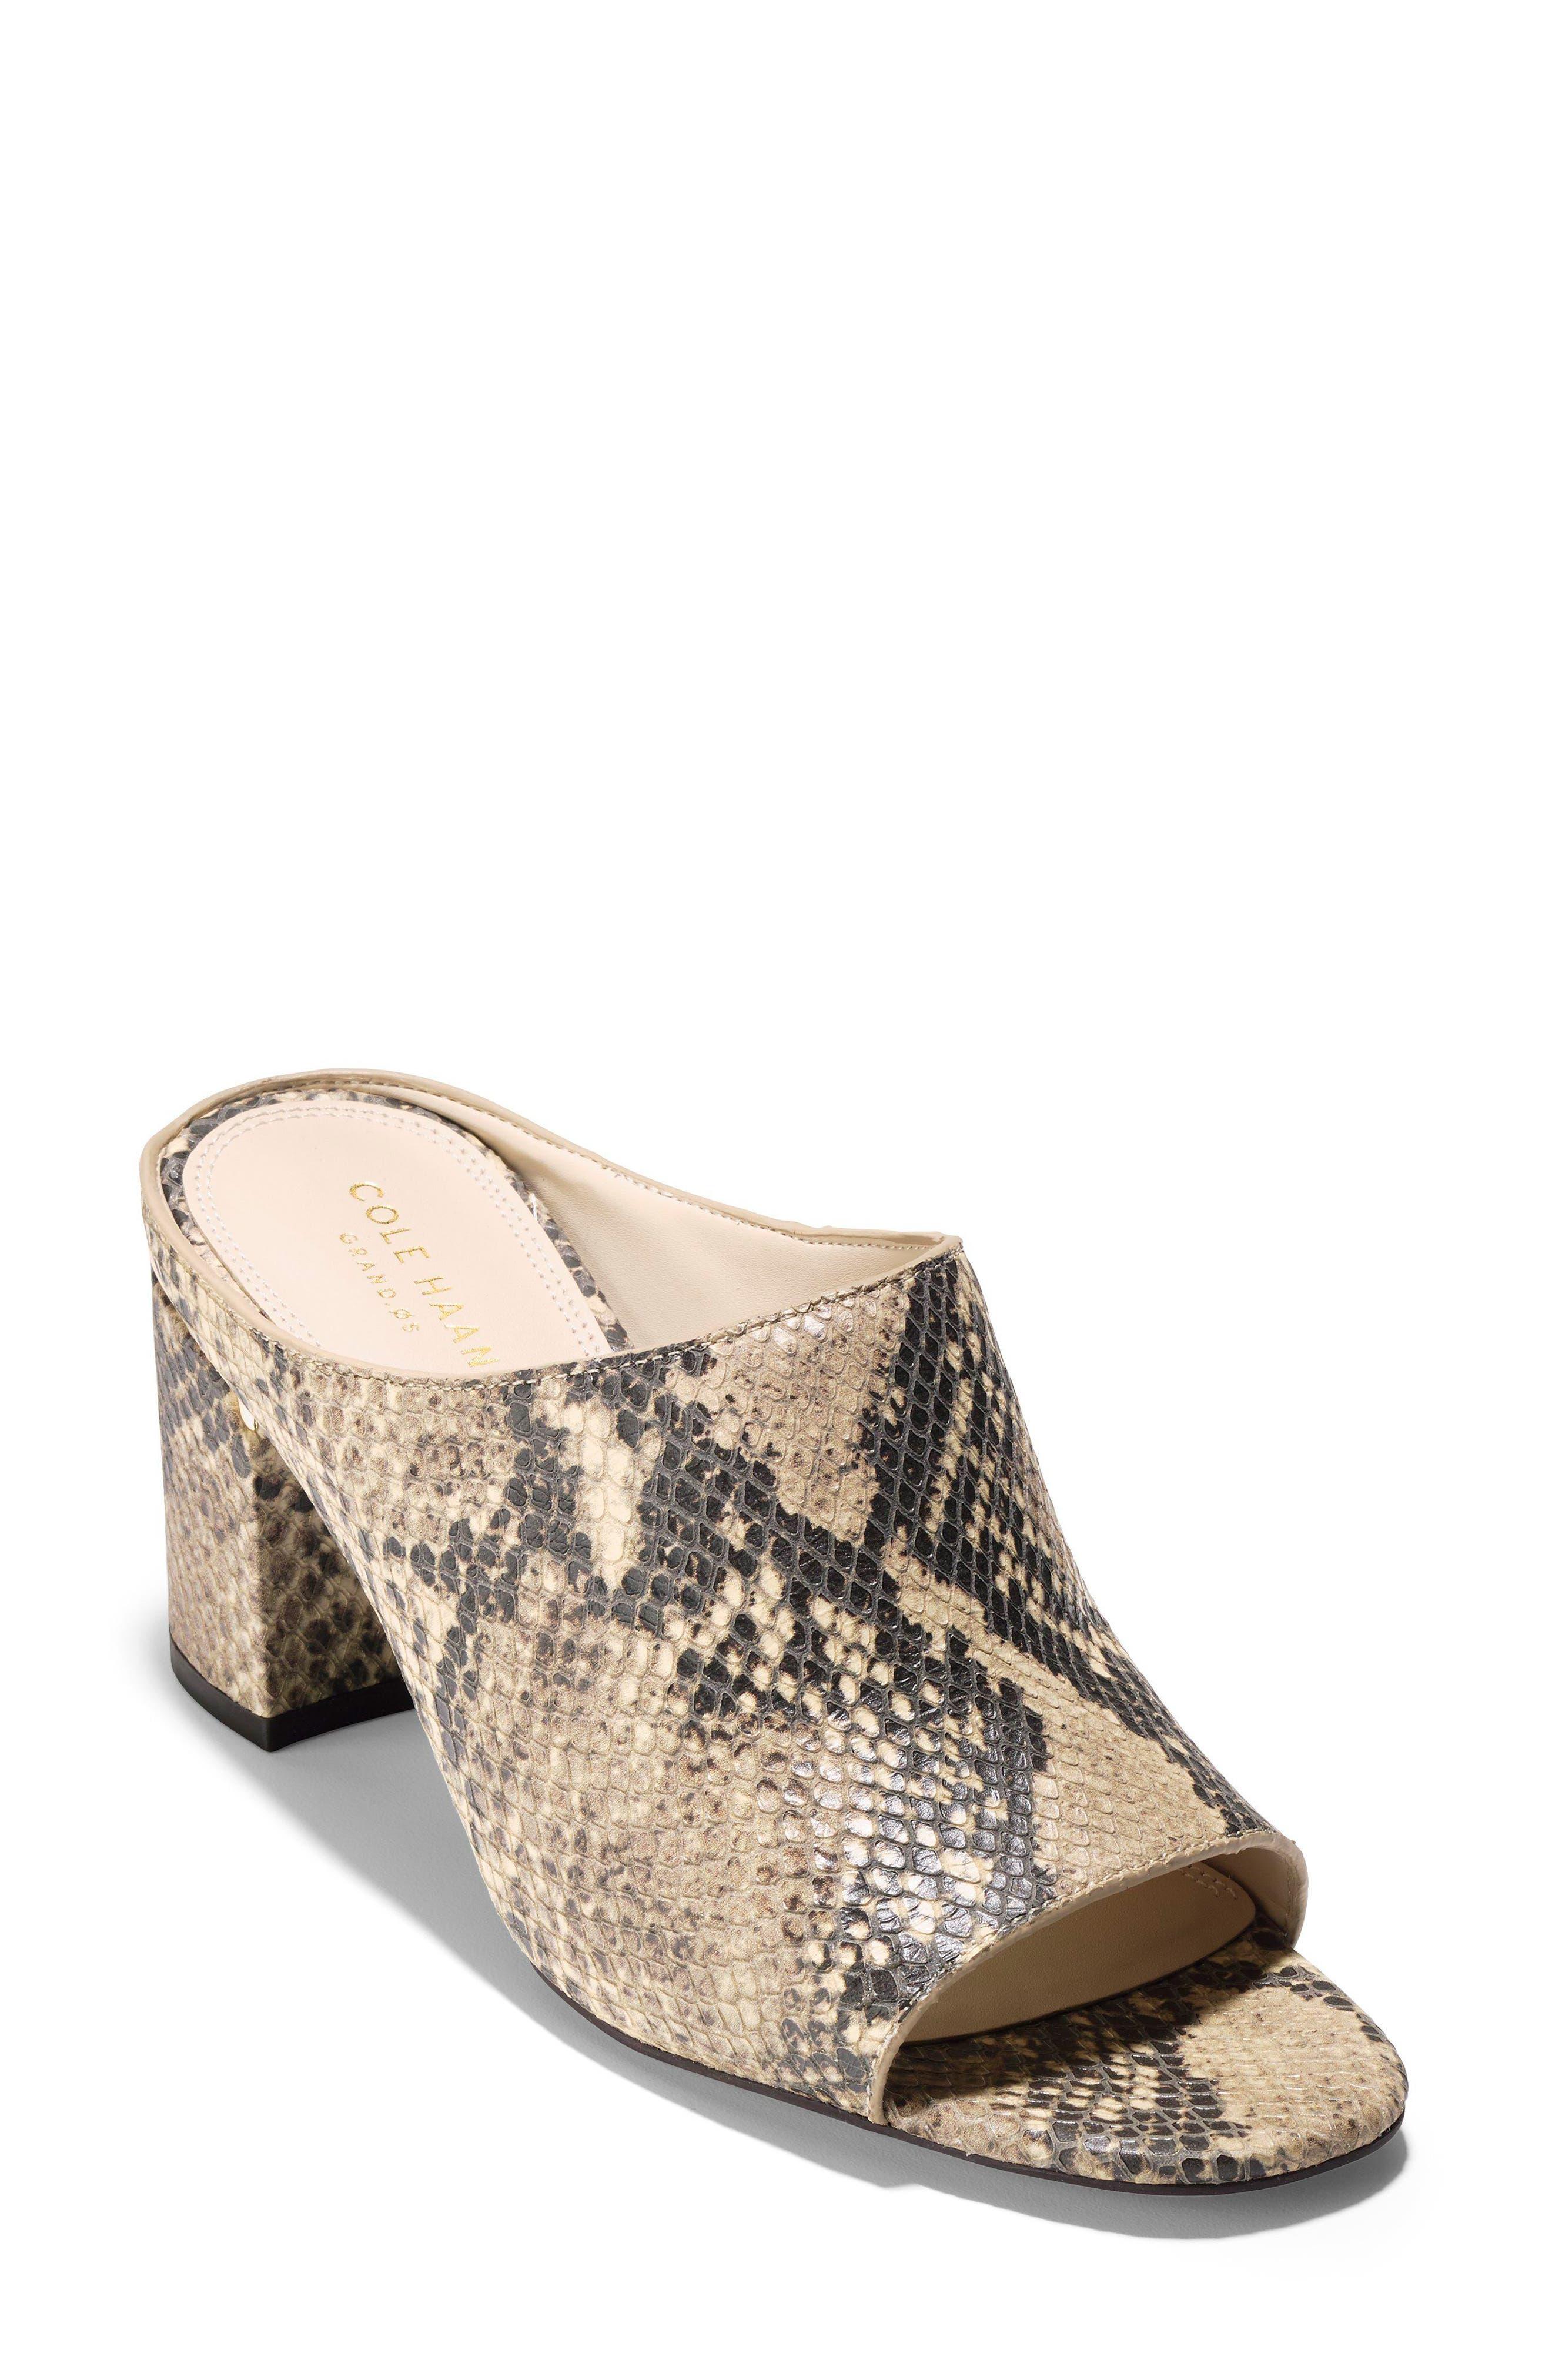 Laree Sandal,                         Main,                         color, Roccia Print Leather